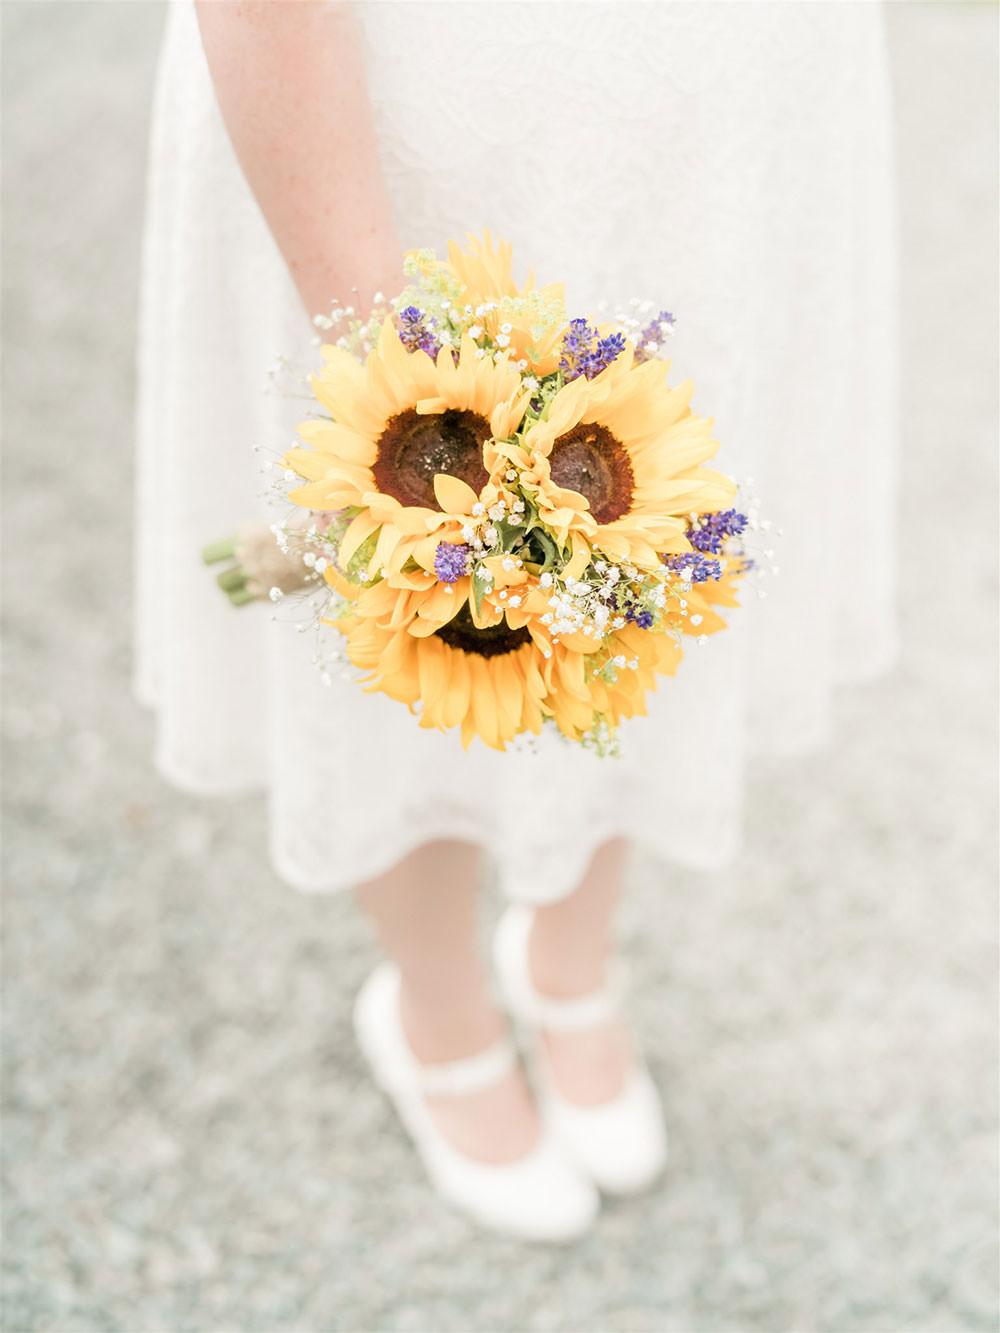 Bride Bridal Sunflower Gypsophila Bouquet Surprise Wedding Carn Patrick Photography